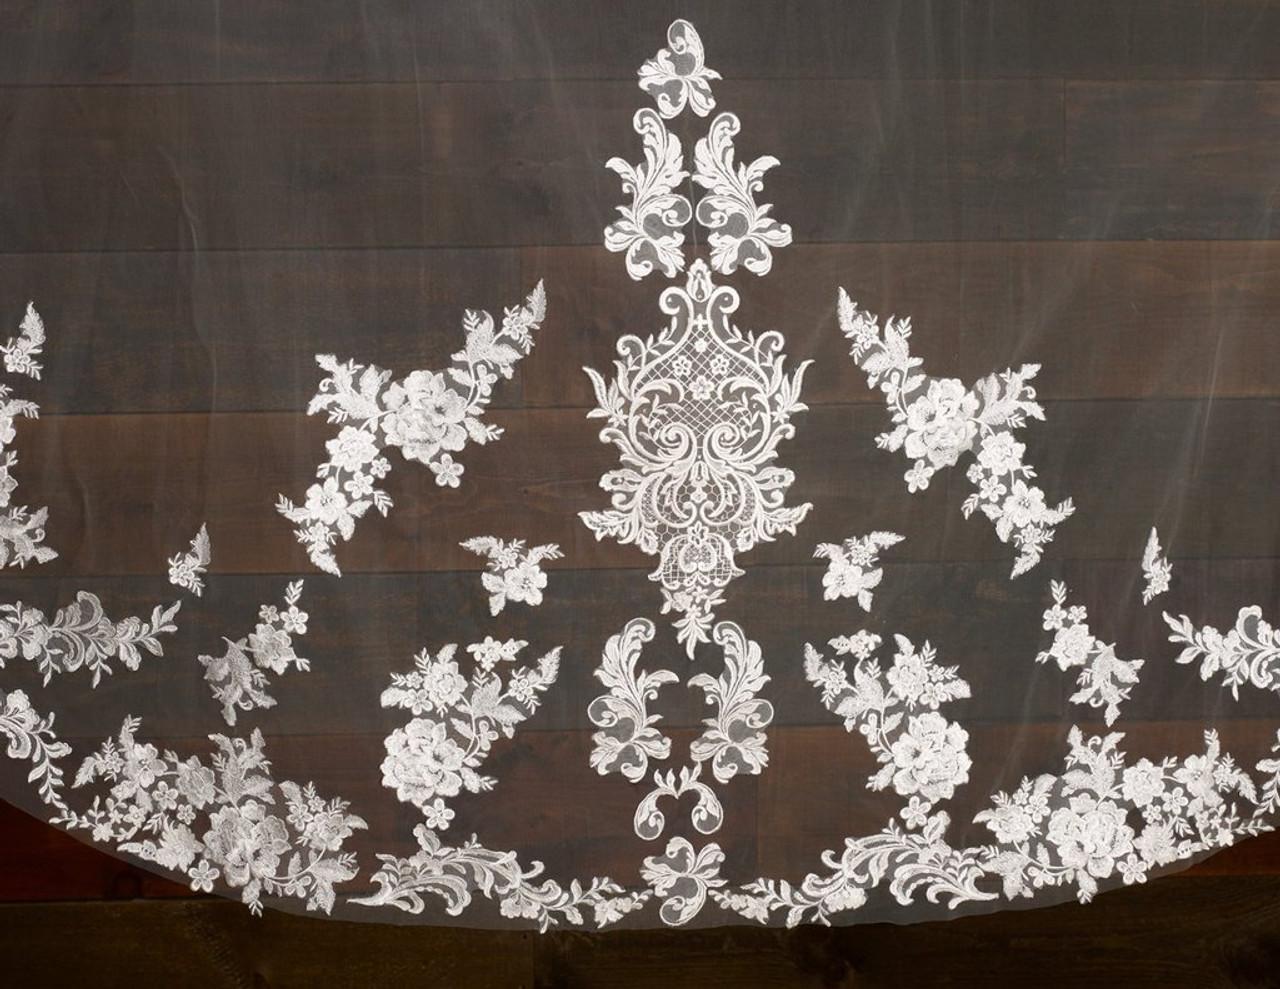 "Marionat Bridal Veils 3788 - 120"" Angel cut beaded lace veil with center appliqués, lace starts 14"" down"